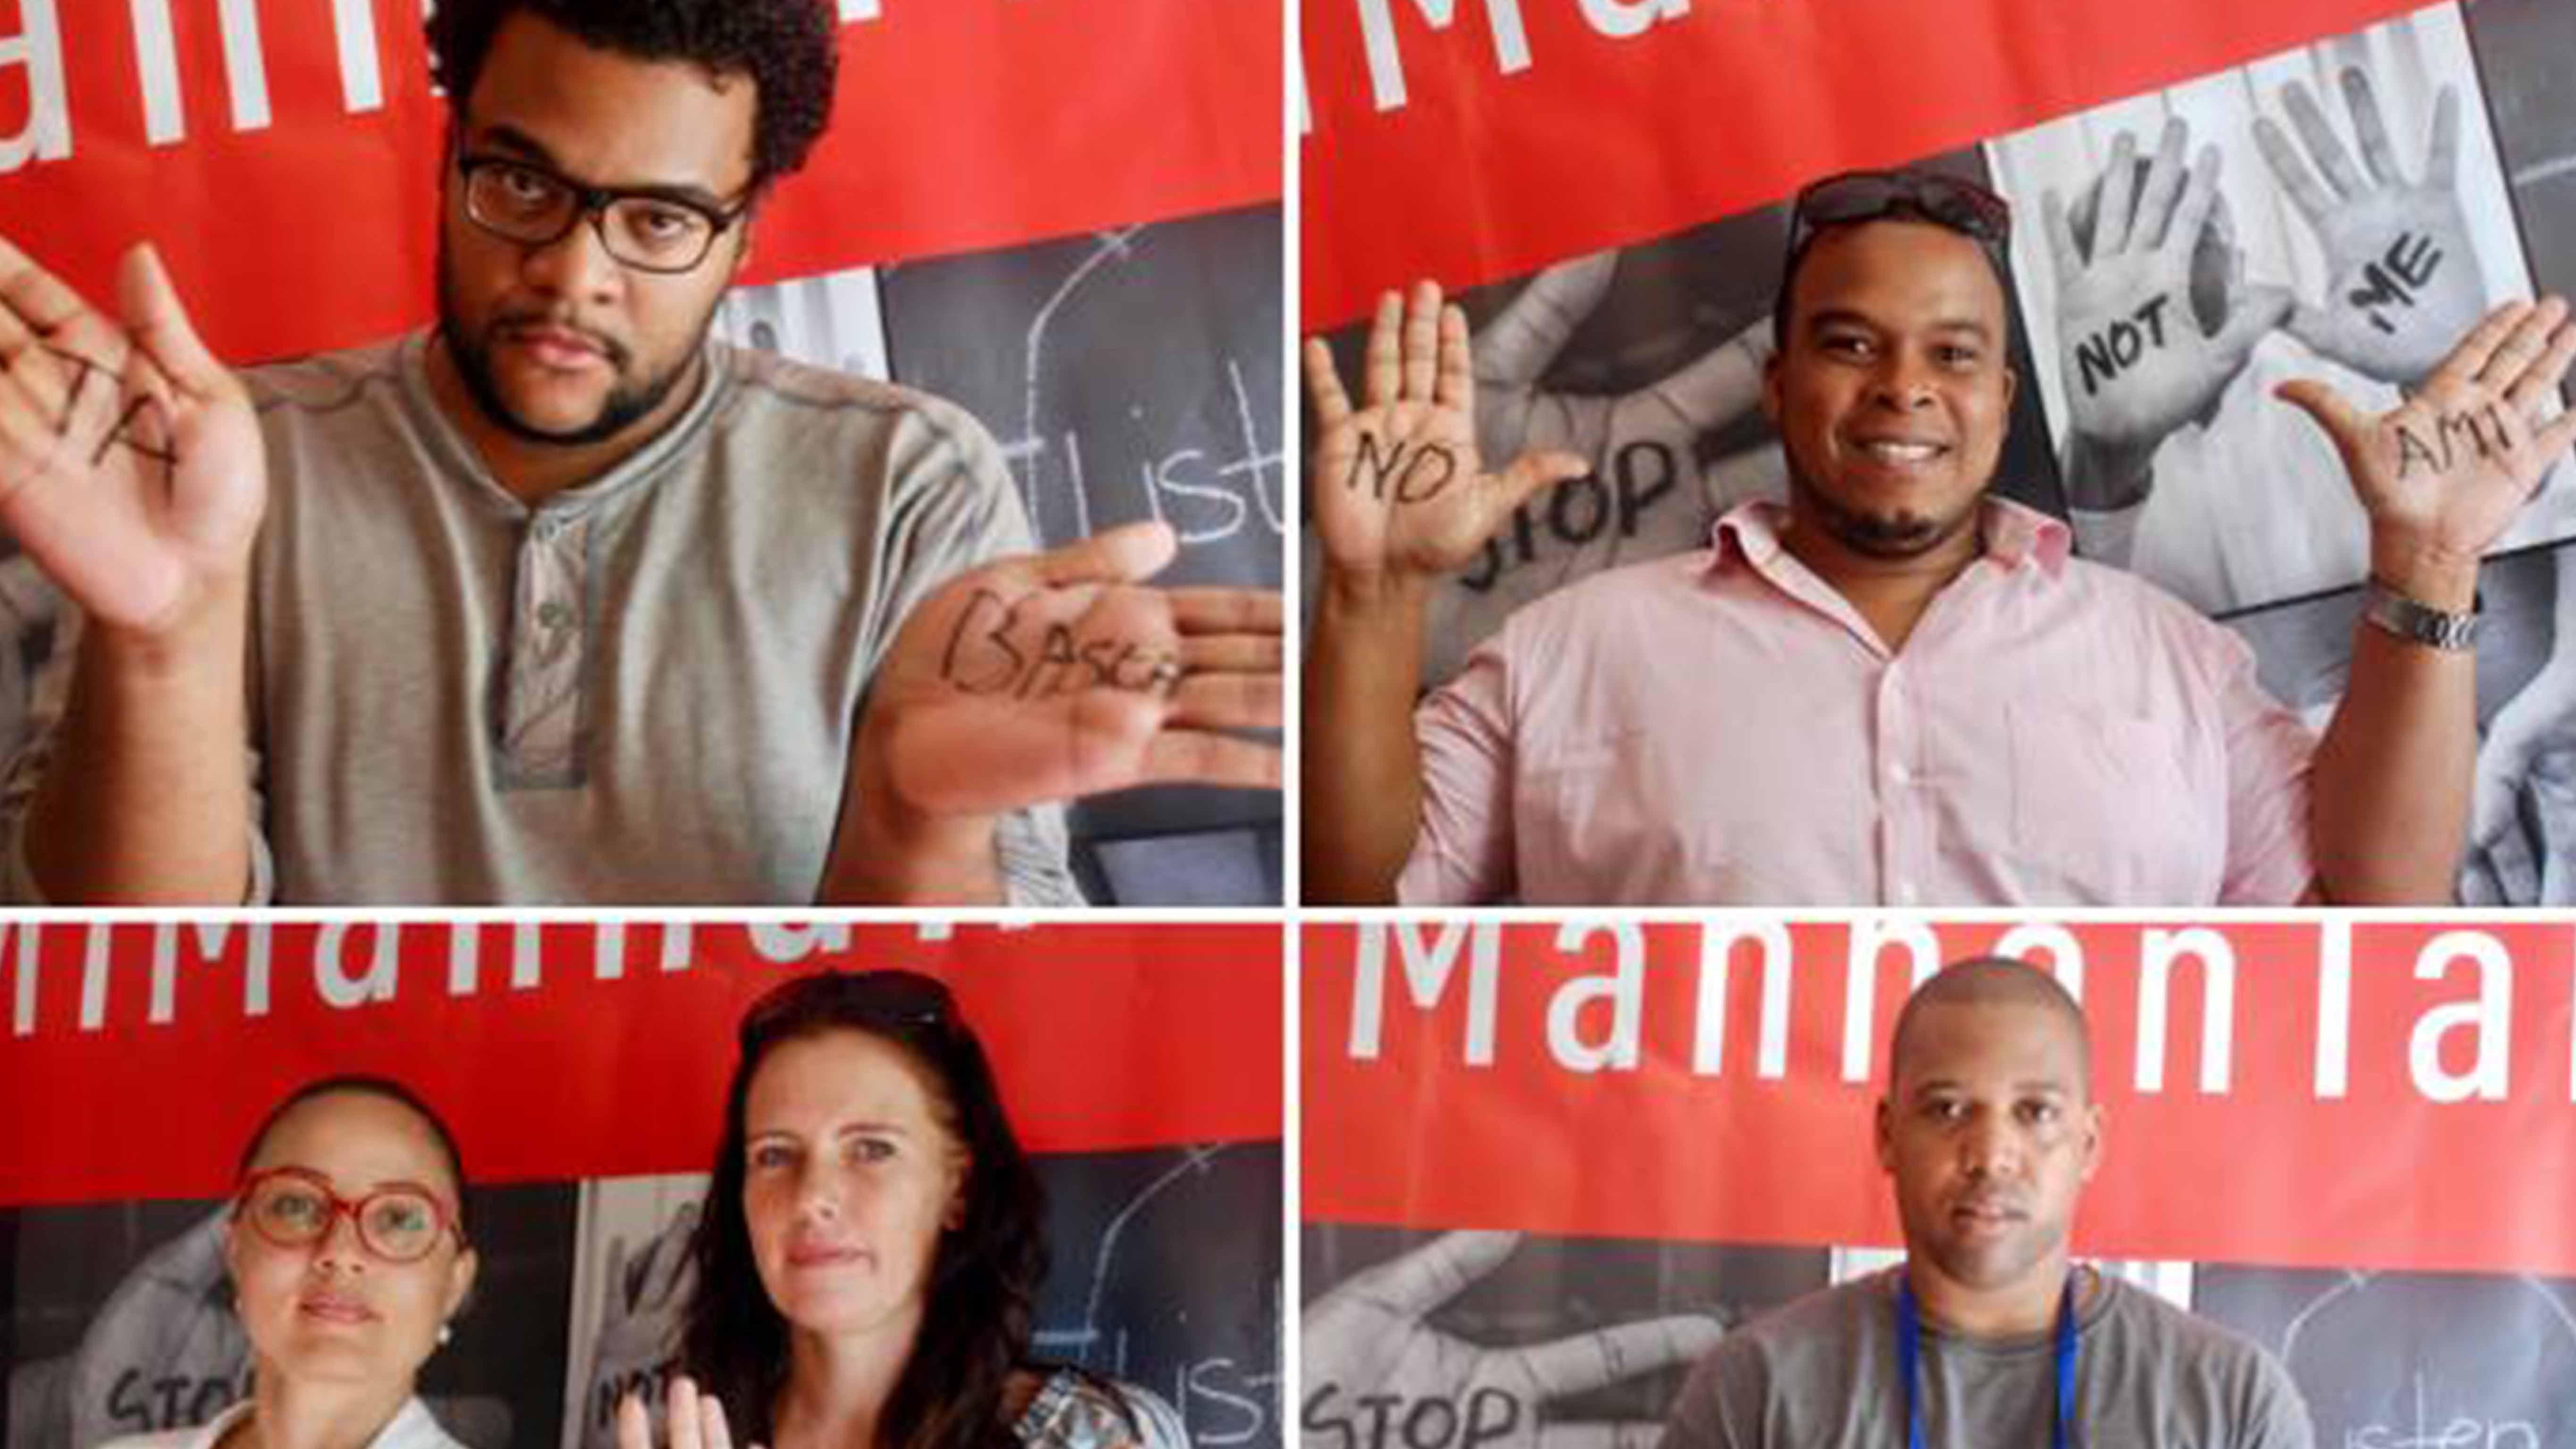 "E Selfie Challenge ""#MiMannanTaLimpi"" ta reta tur hende pa públikamente hisa man i hasi un testimonio kontra di korupshon."